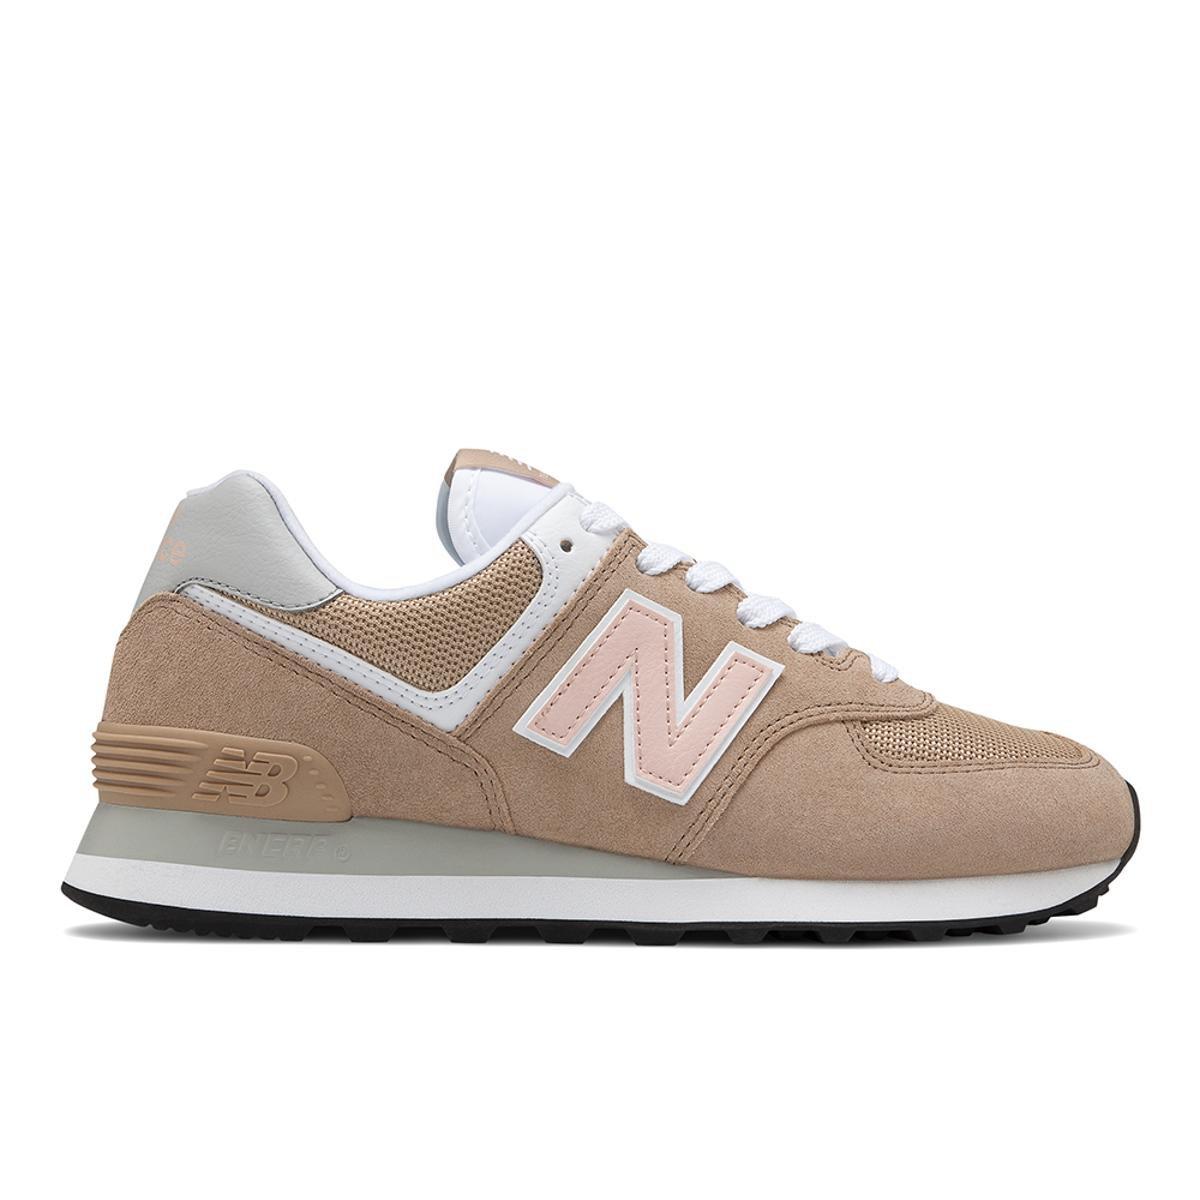 size 40 1d5d7 60123 Tênis New Balance 574 Casual Feminino - Bege